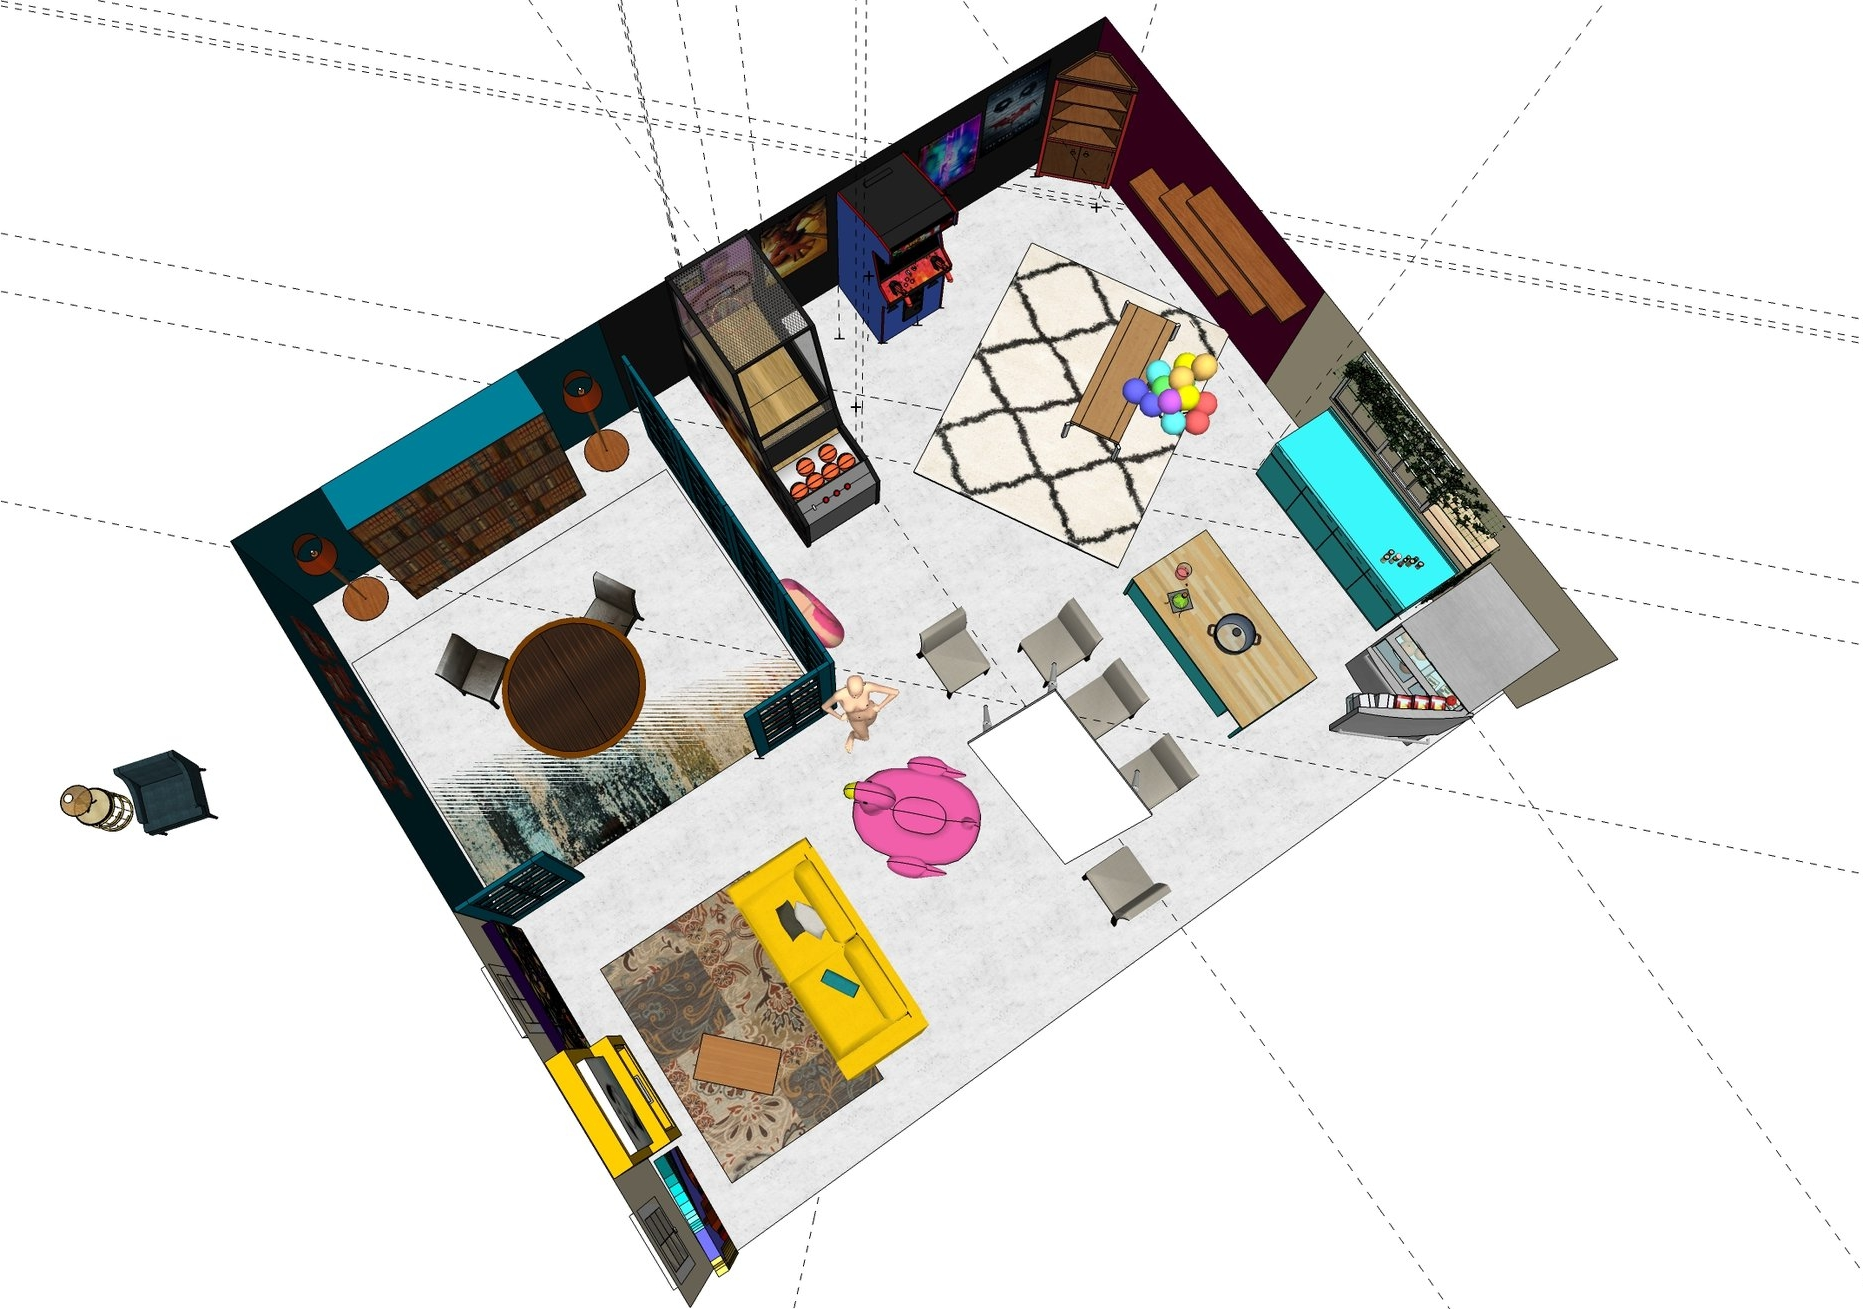 Overview 1.jpg